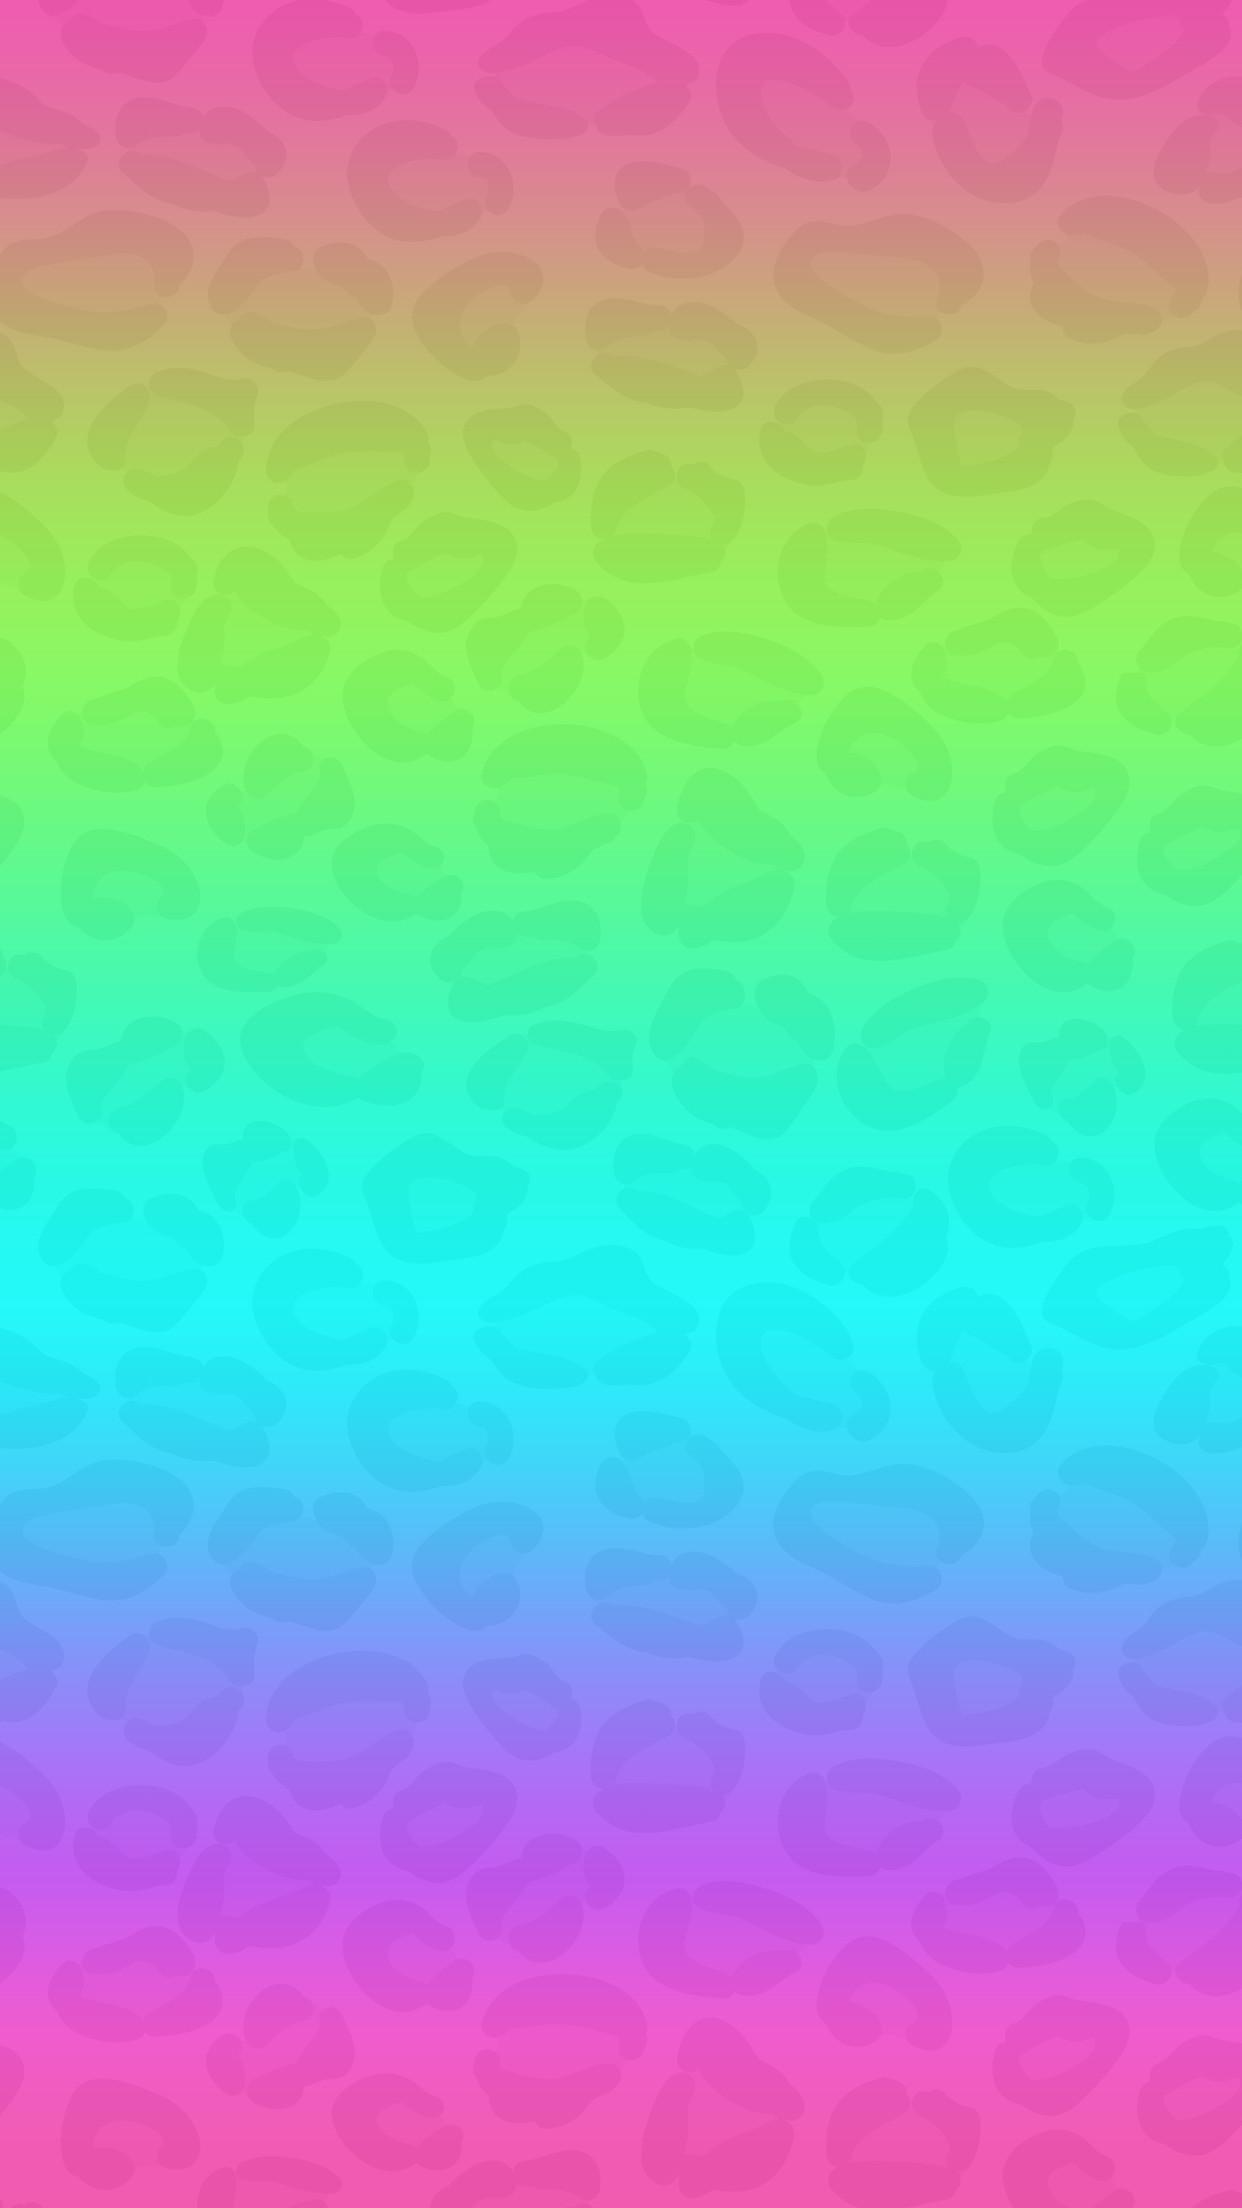 Gradient, ombre, pink, blue, purple, green, wallpaper, hd,